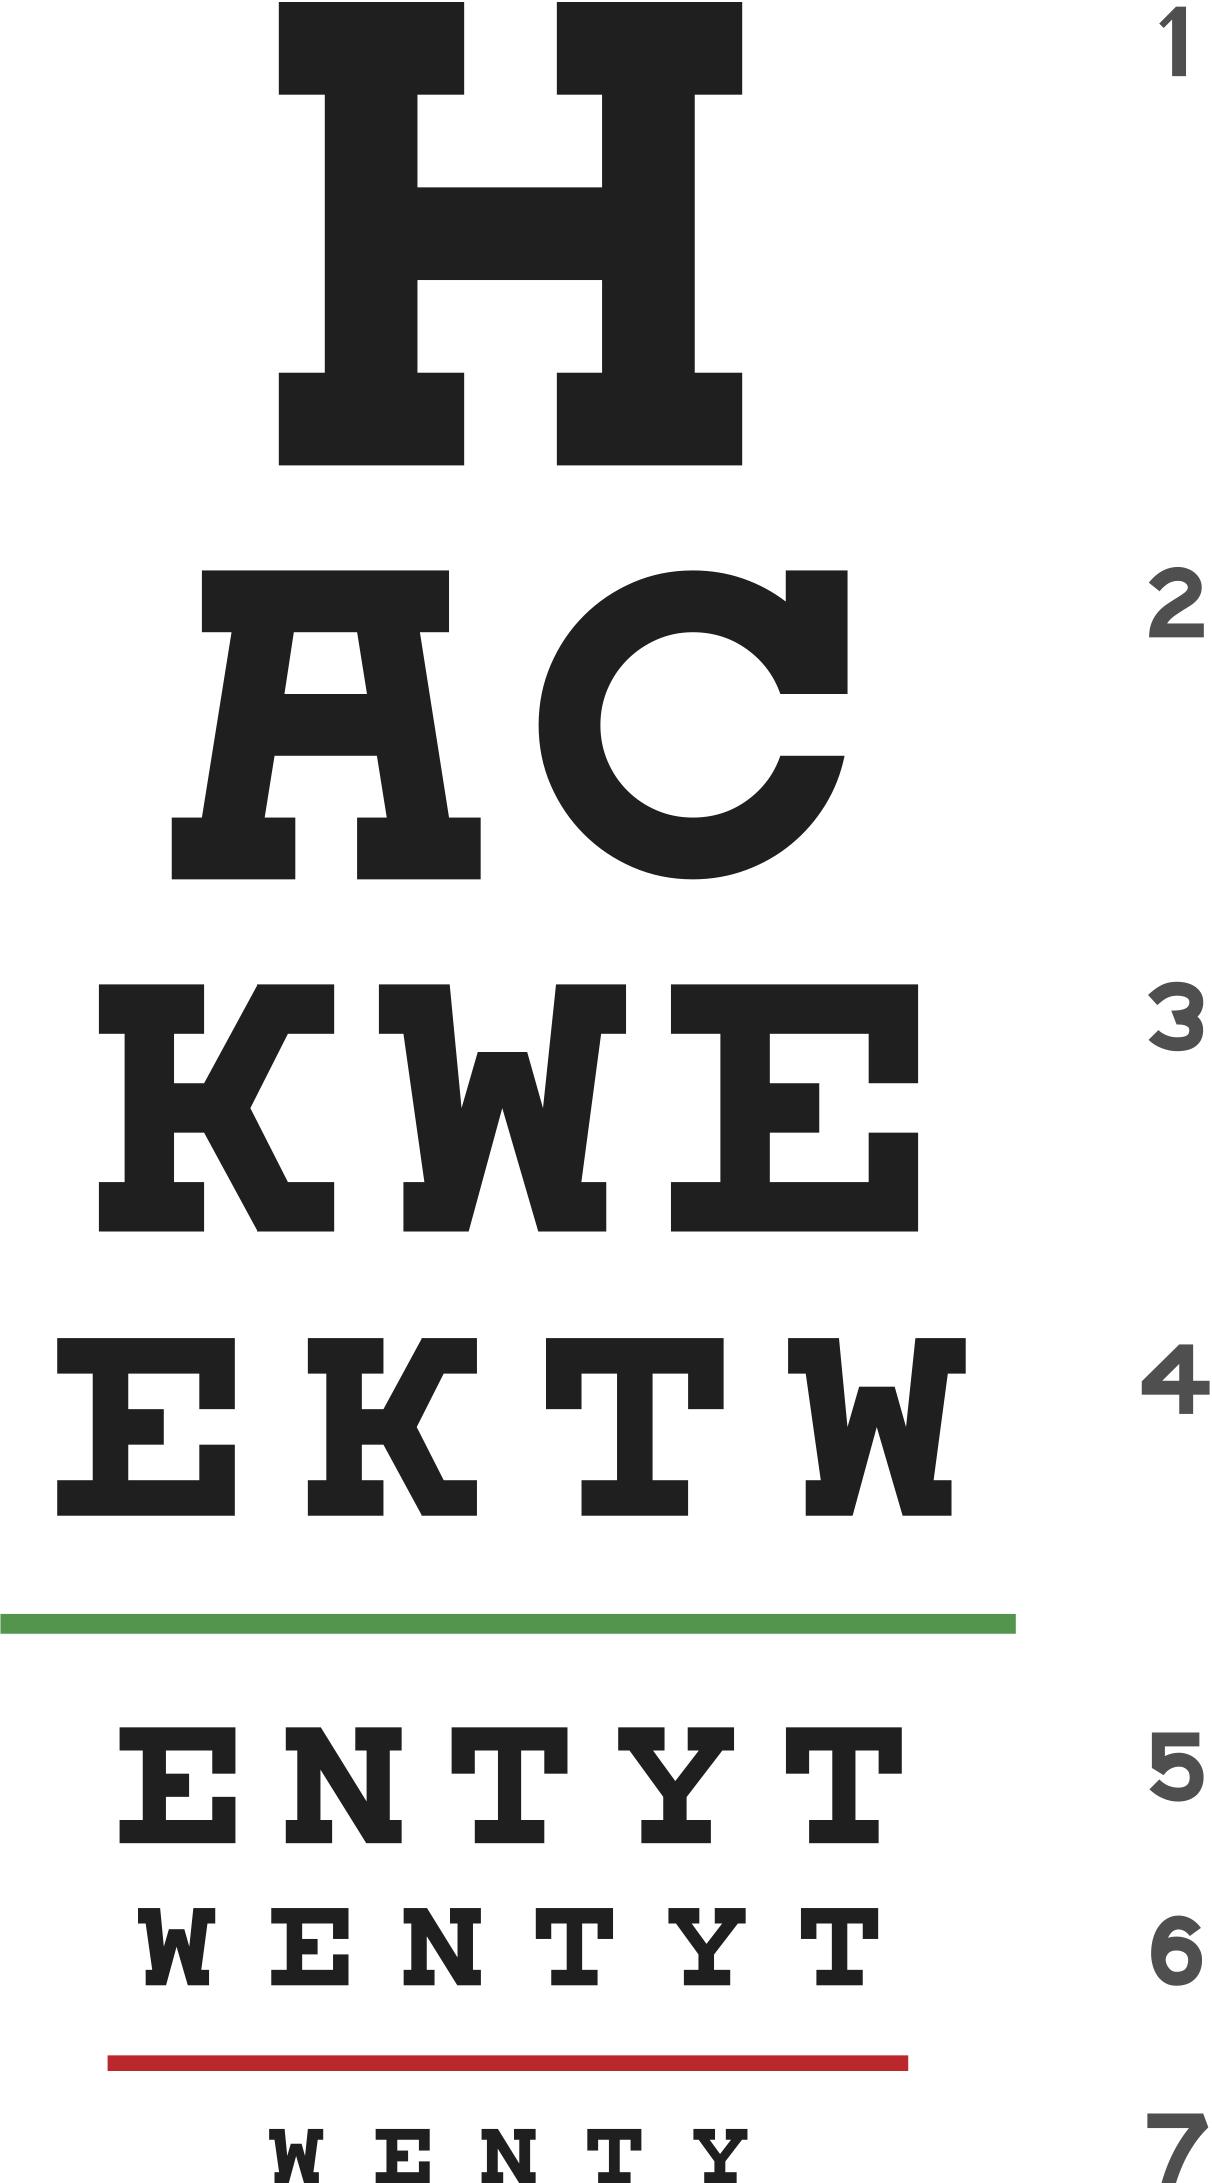 Hack Week 20 t-shirt logo designed by Zillow employee Scott Smith. It looks like an eye exam poster